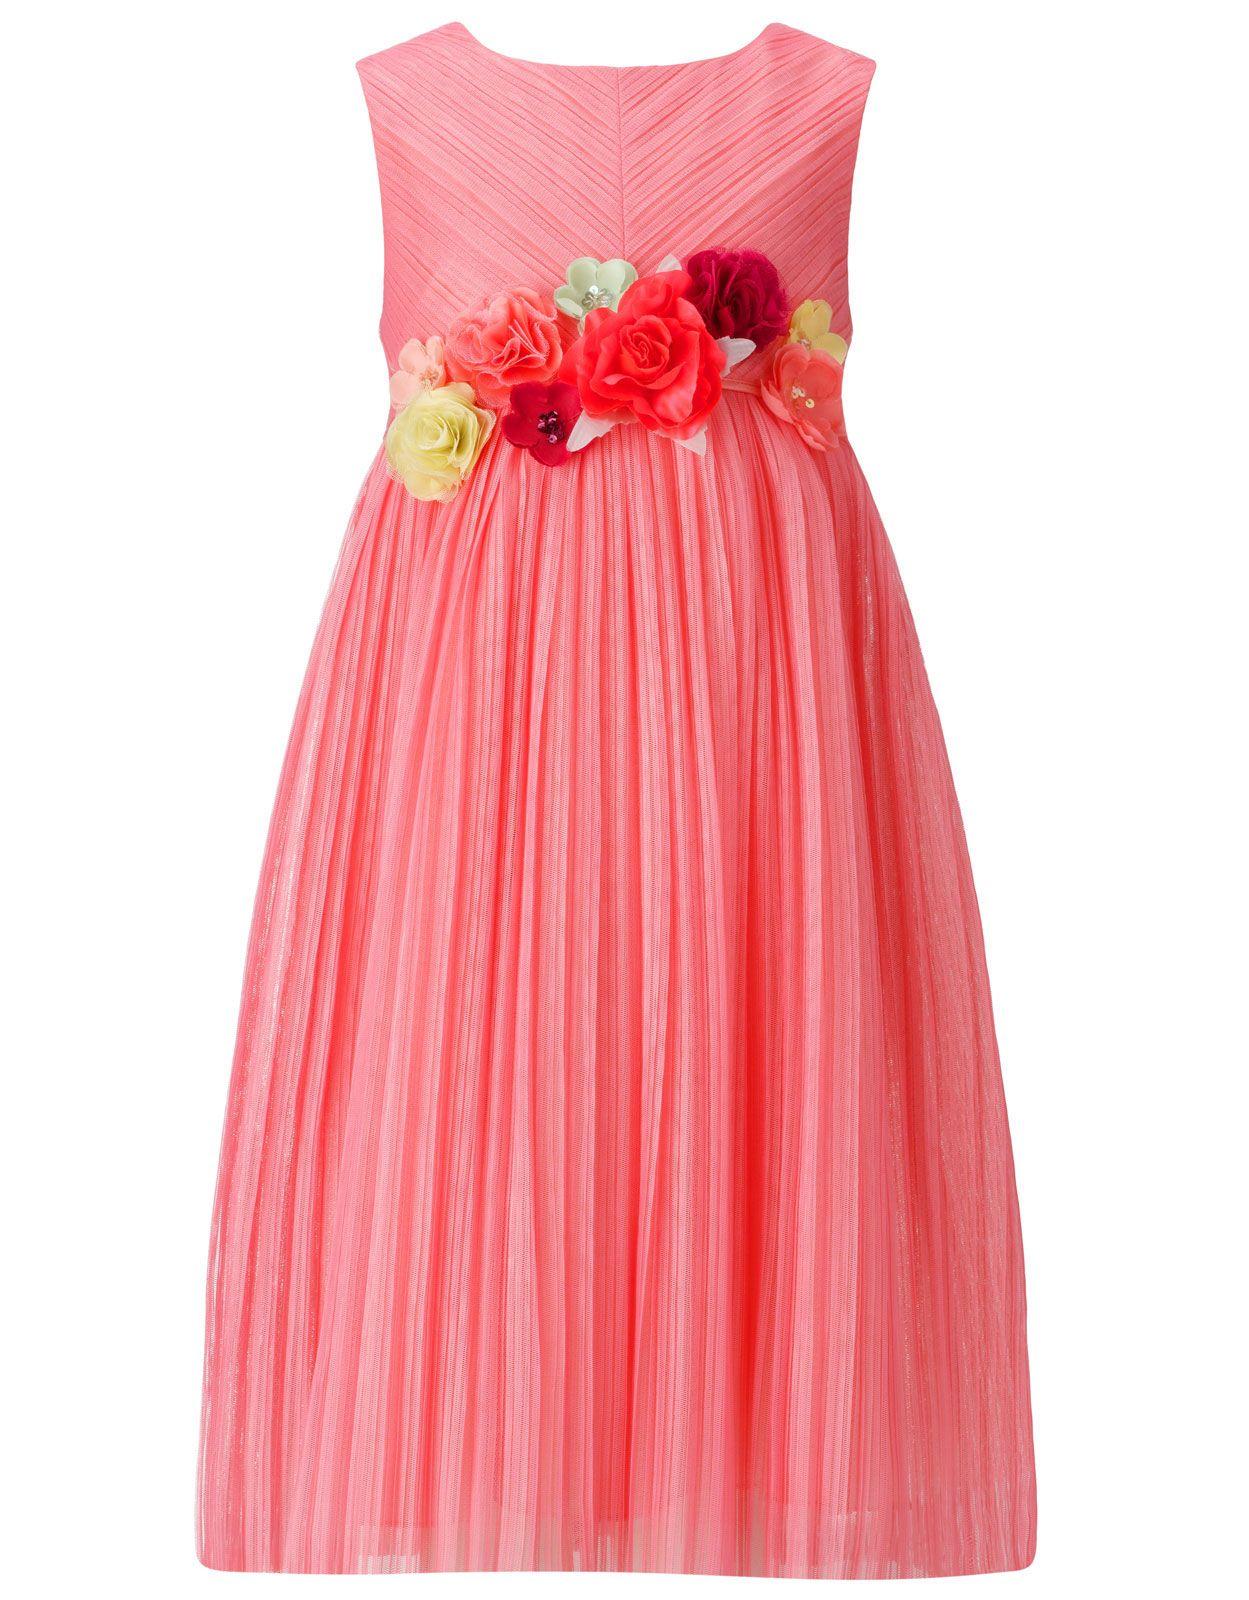 Scarletta Flower Dress | Ava Wedding | Pinterest